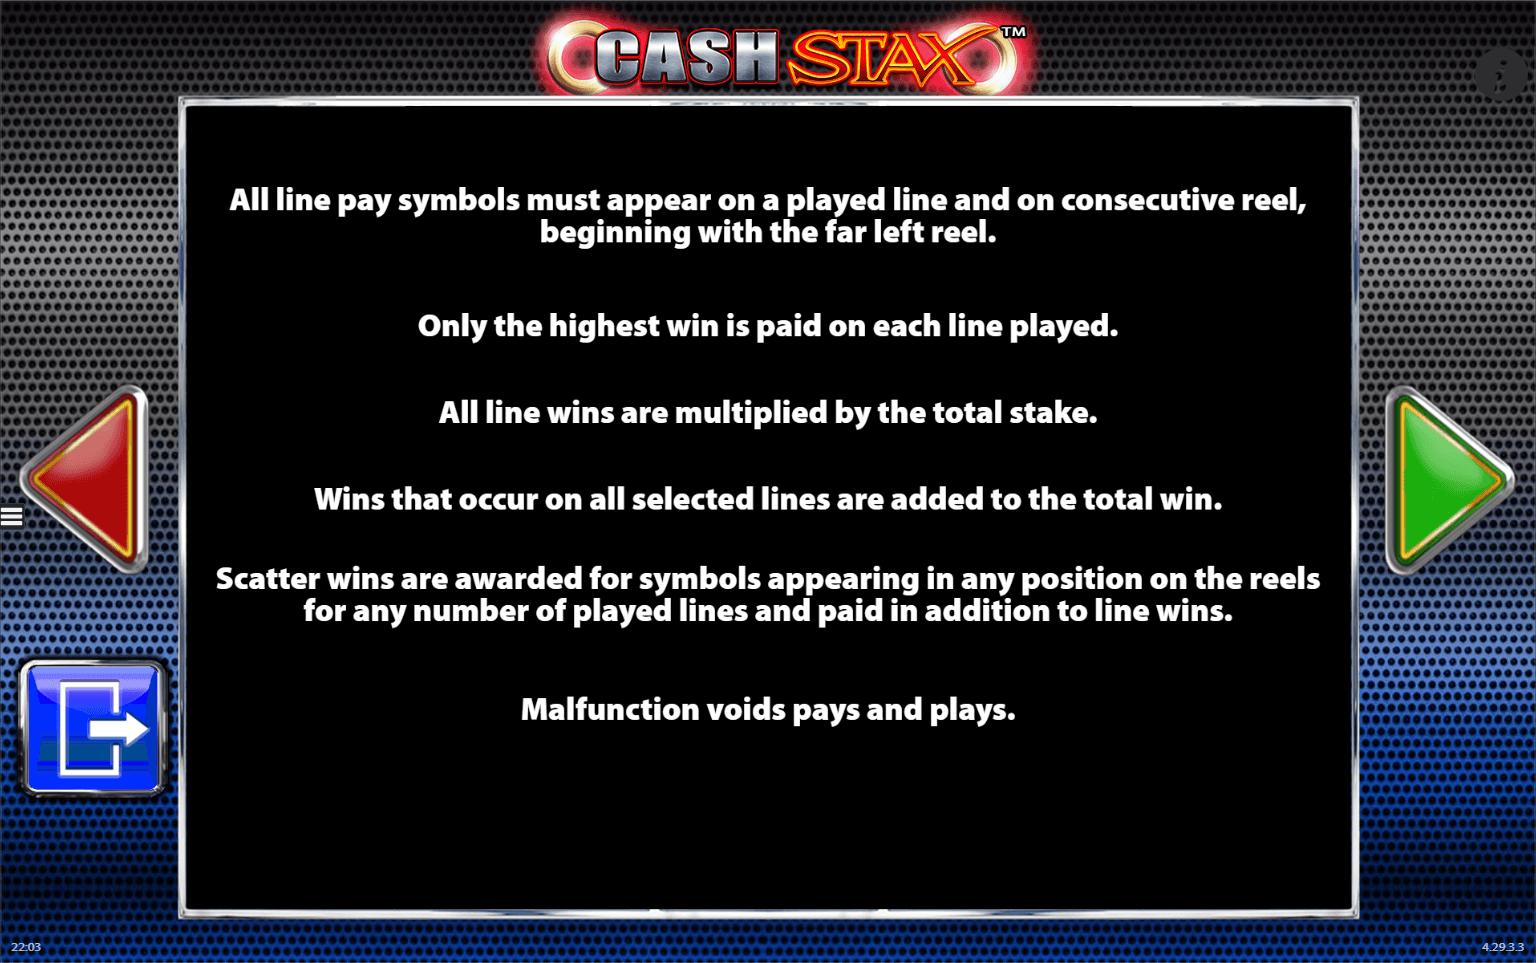 Cash Stax free play